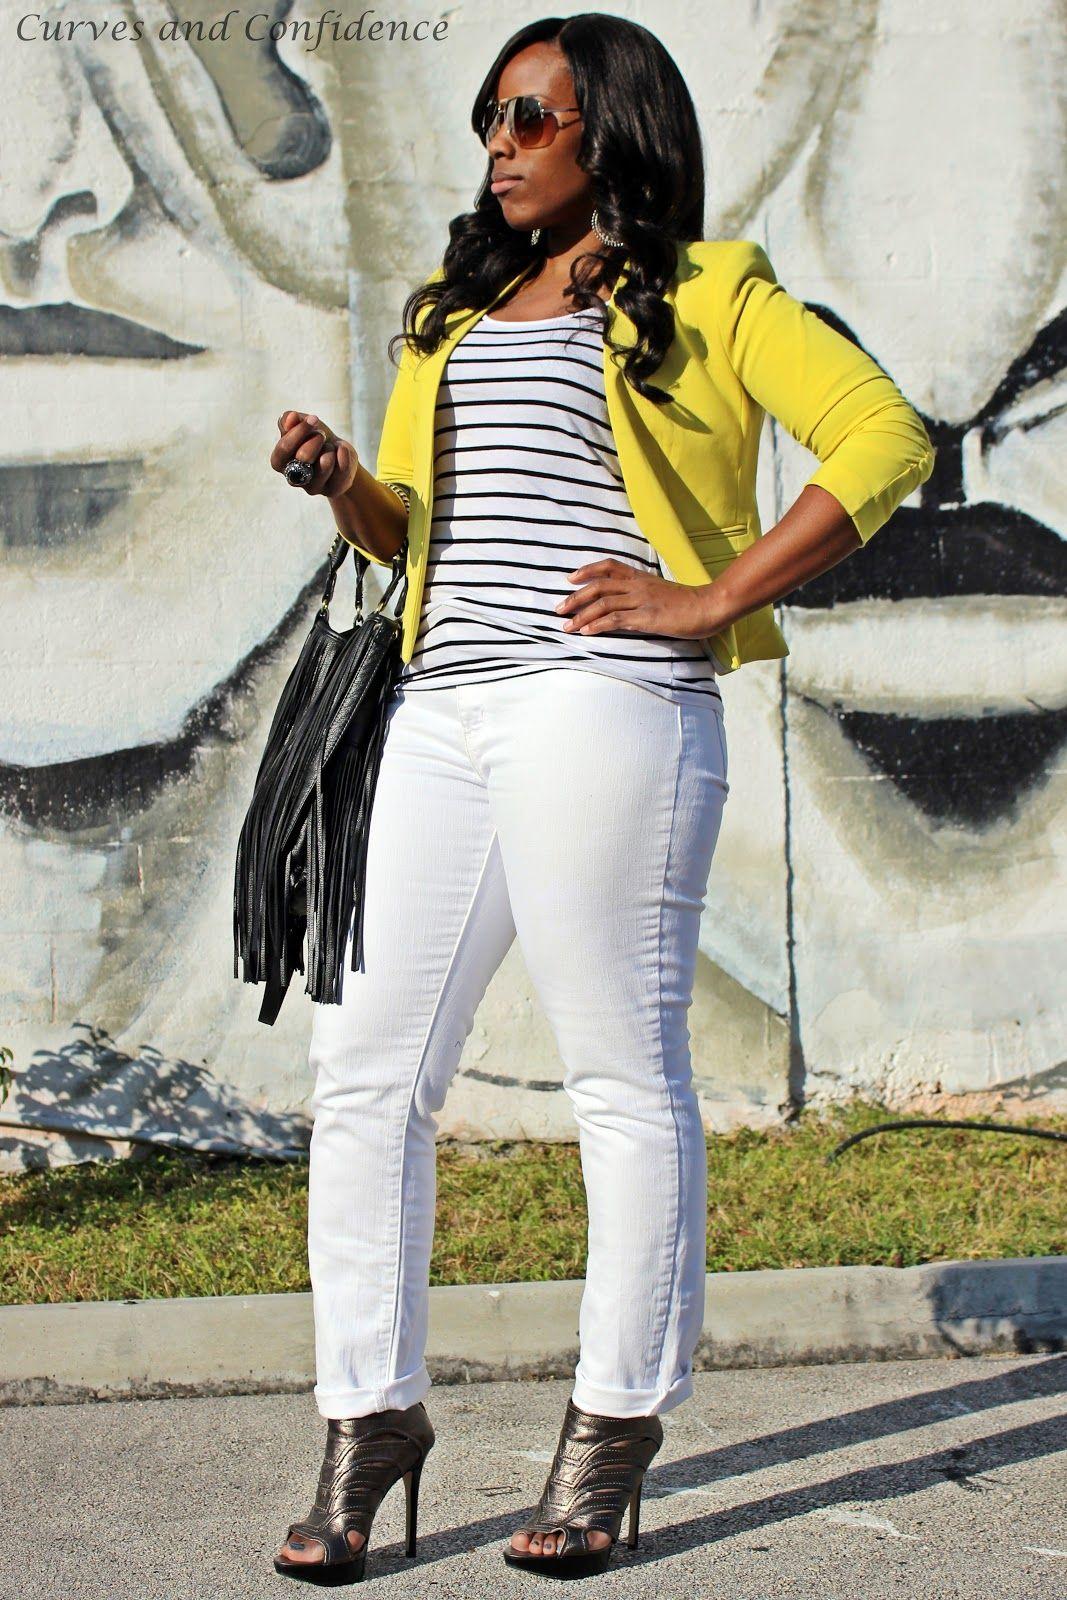 yellow and black and white attire - Google Search | Fashion ...